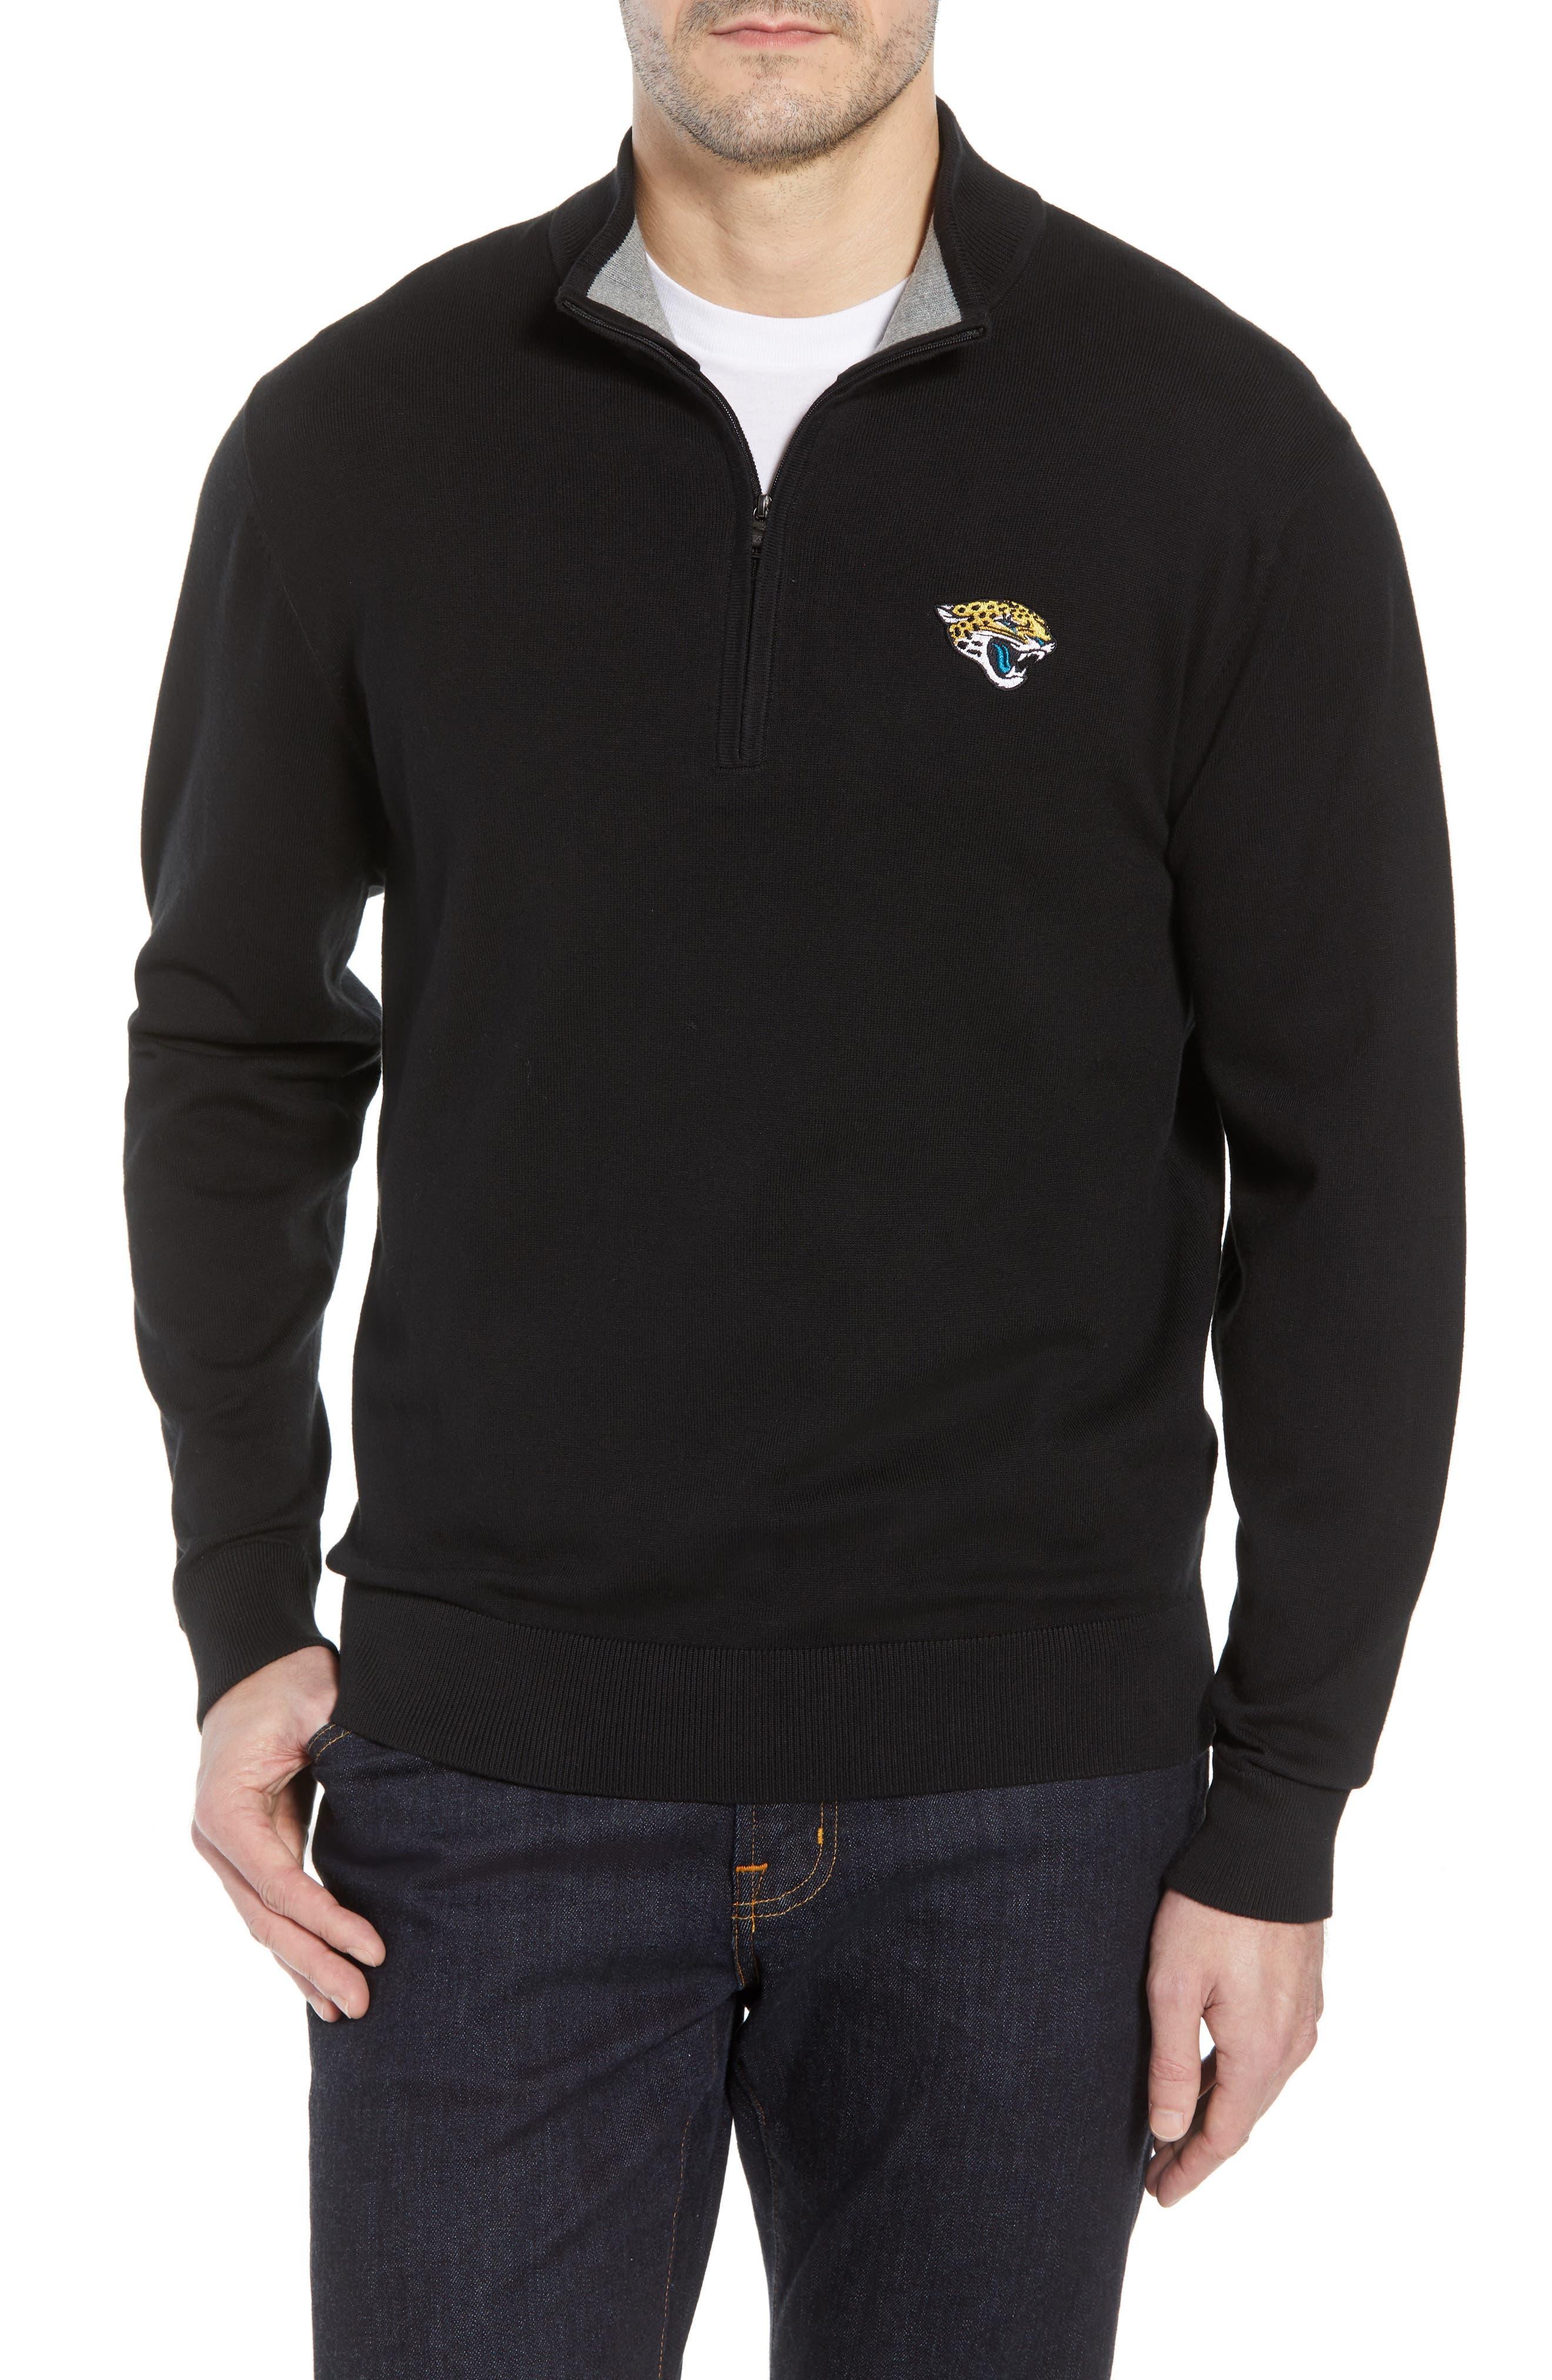 Jacksonville Jaguars - Lakemont Regular Fit Quarter Zip Sweater,                         Main,                         color, BLACK